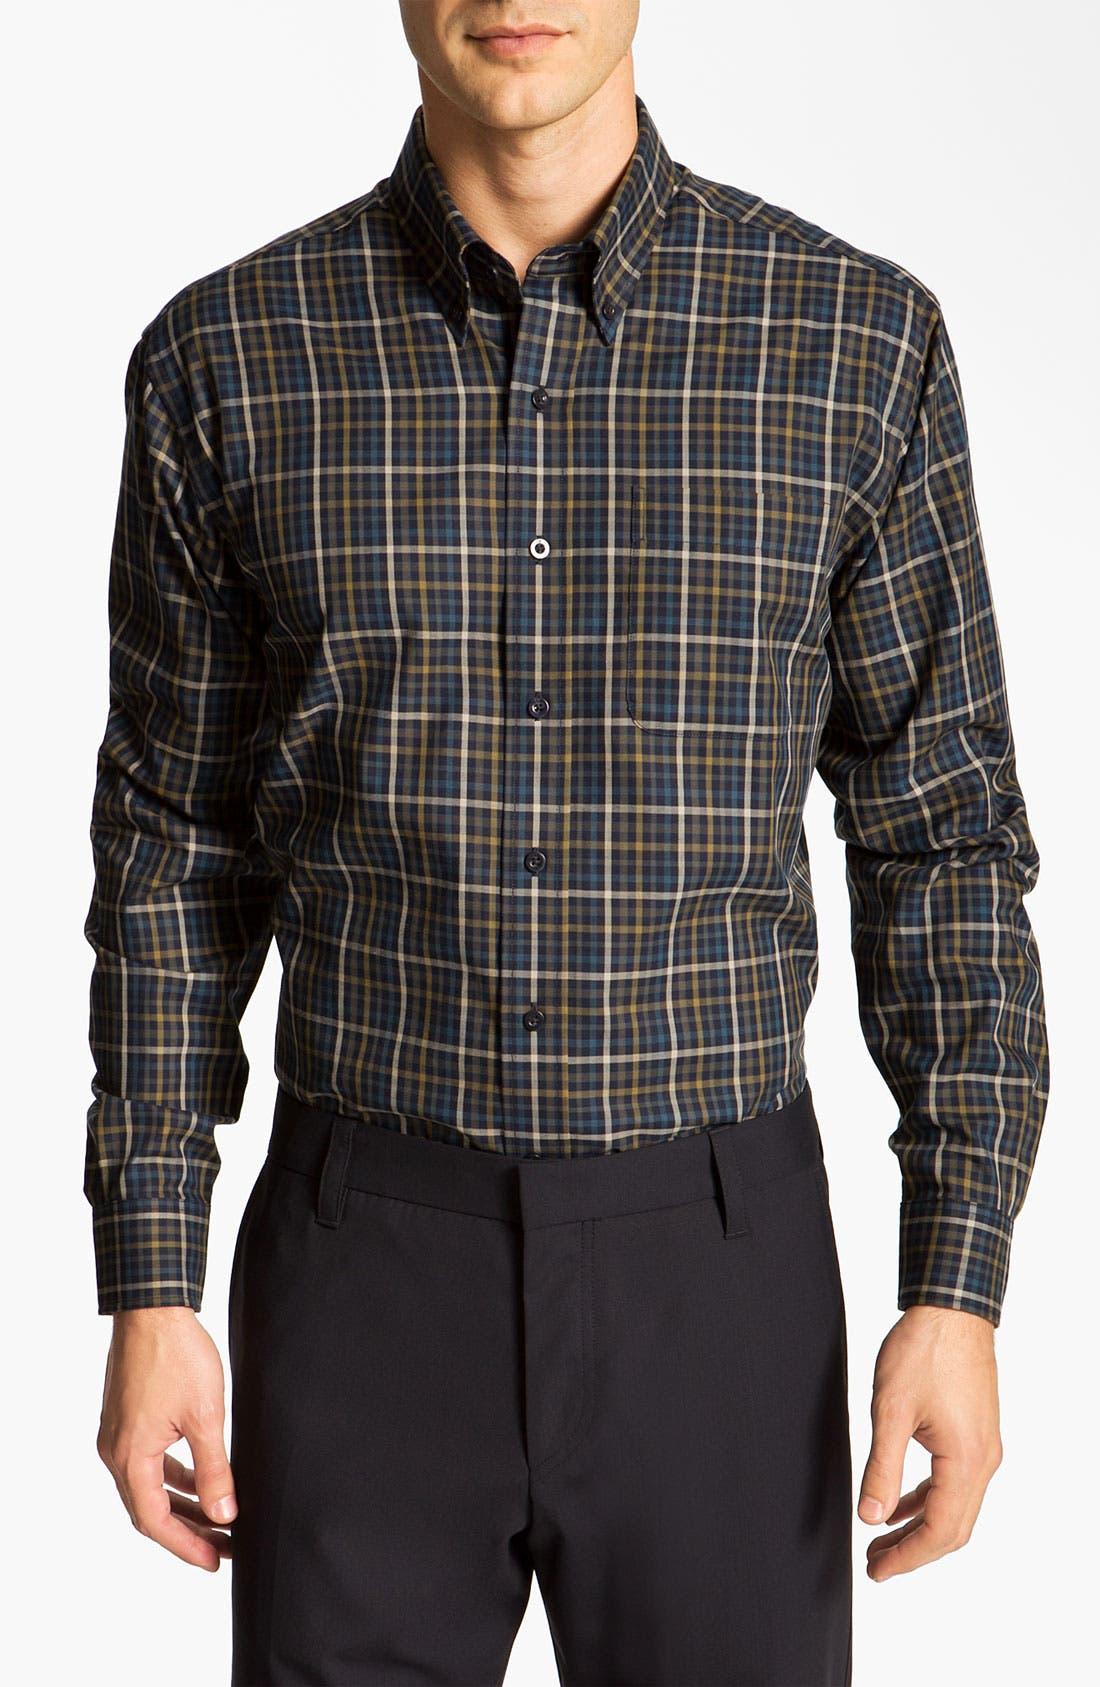 Alternate Image 1 Selected - Cutter & Buck 'Cypress' Check Sport Shirt (Online Only)